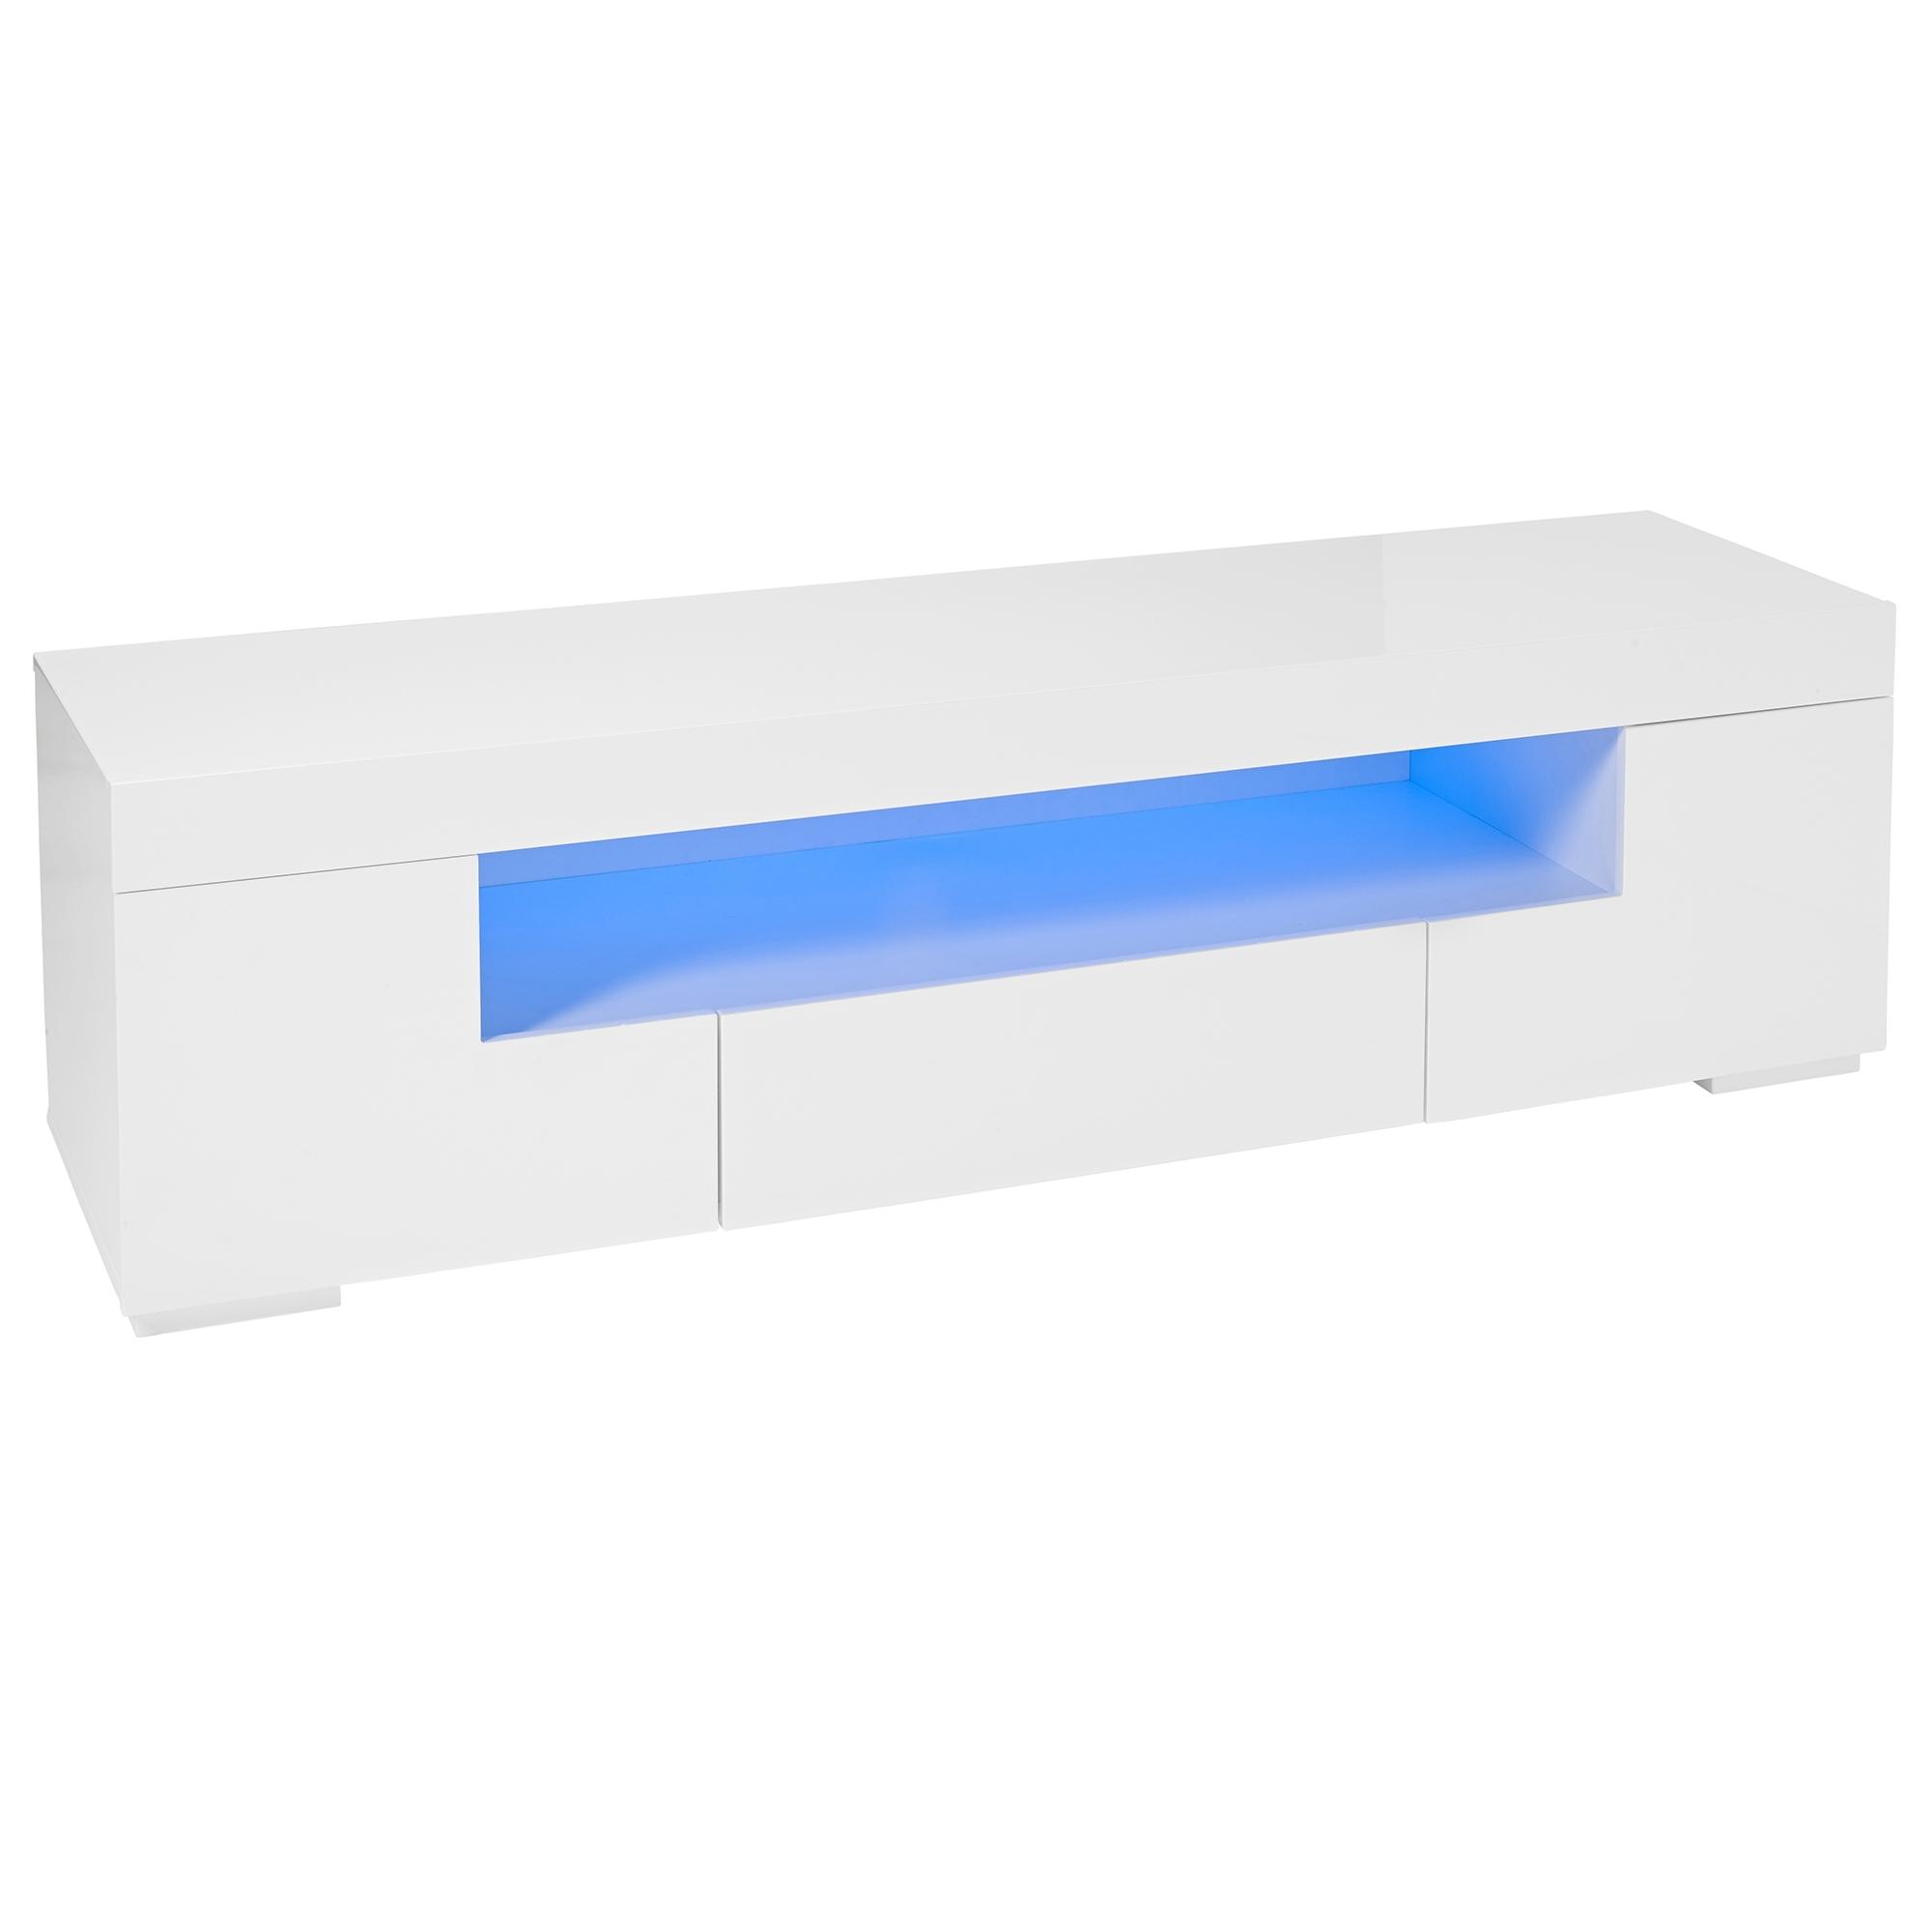 Milano led tv cabinet modern light up furniture for sale online now